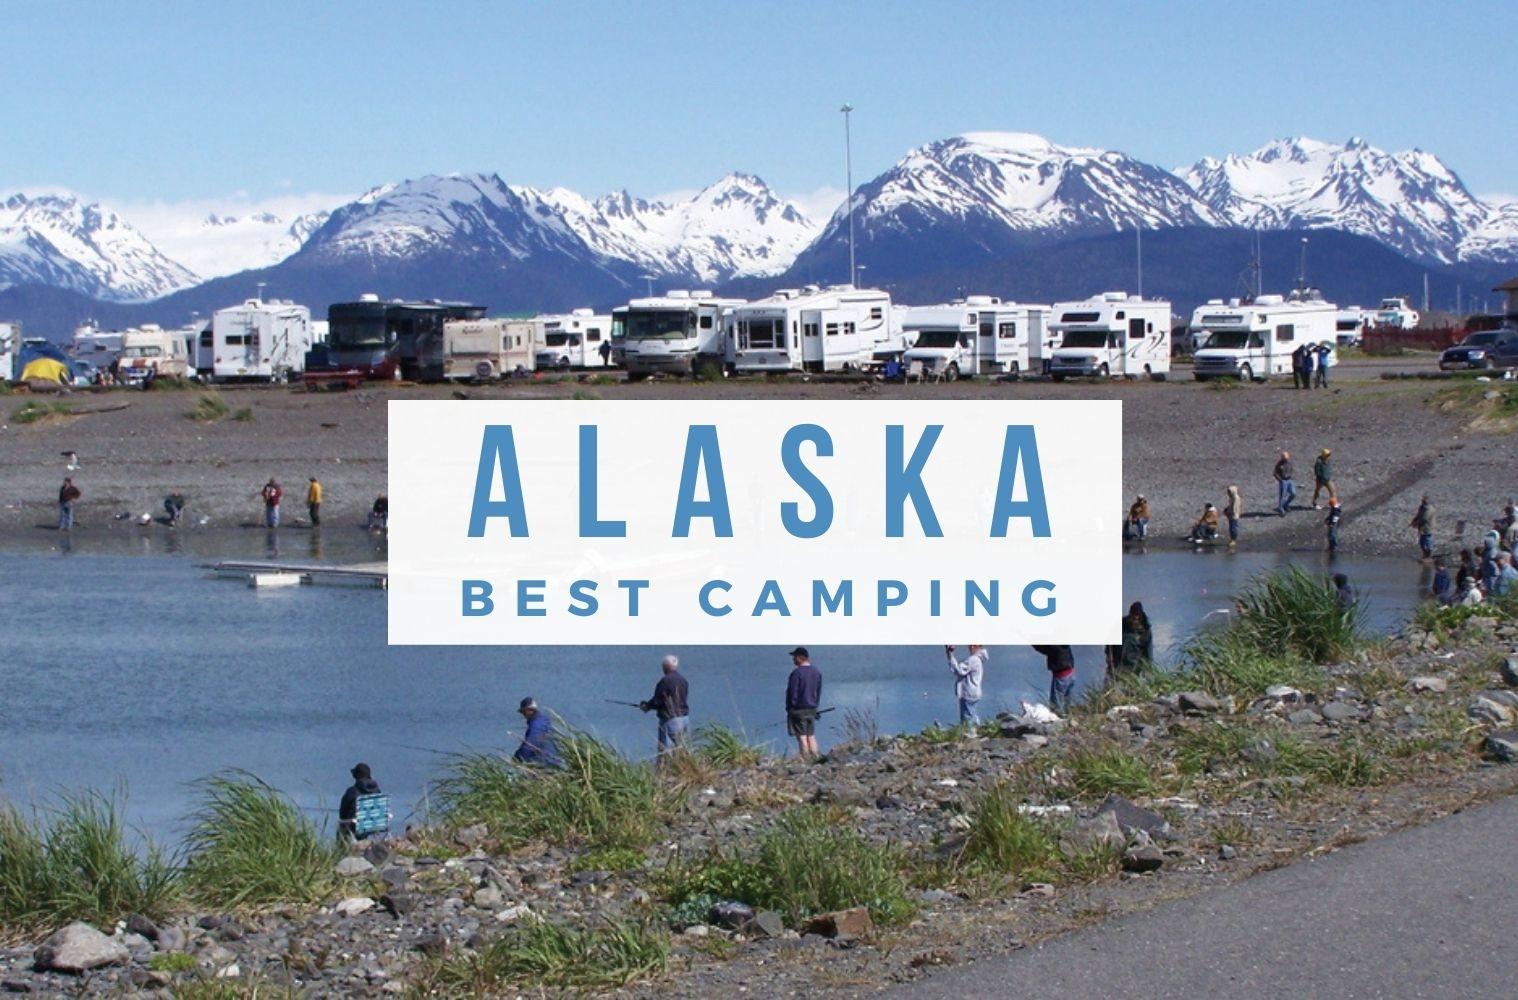 Best Camping in Alaska